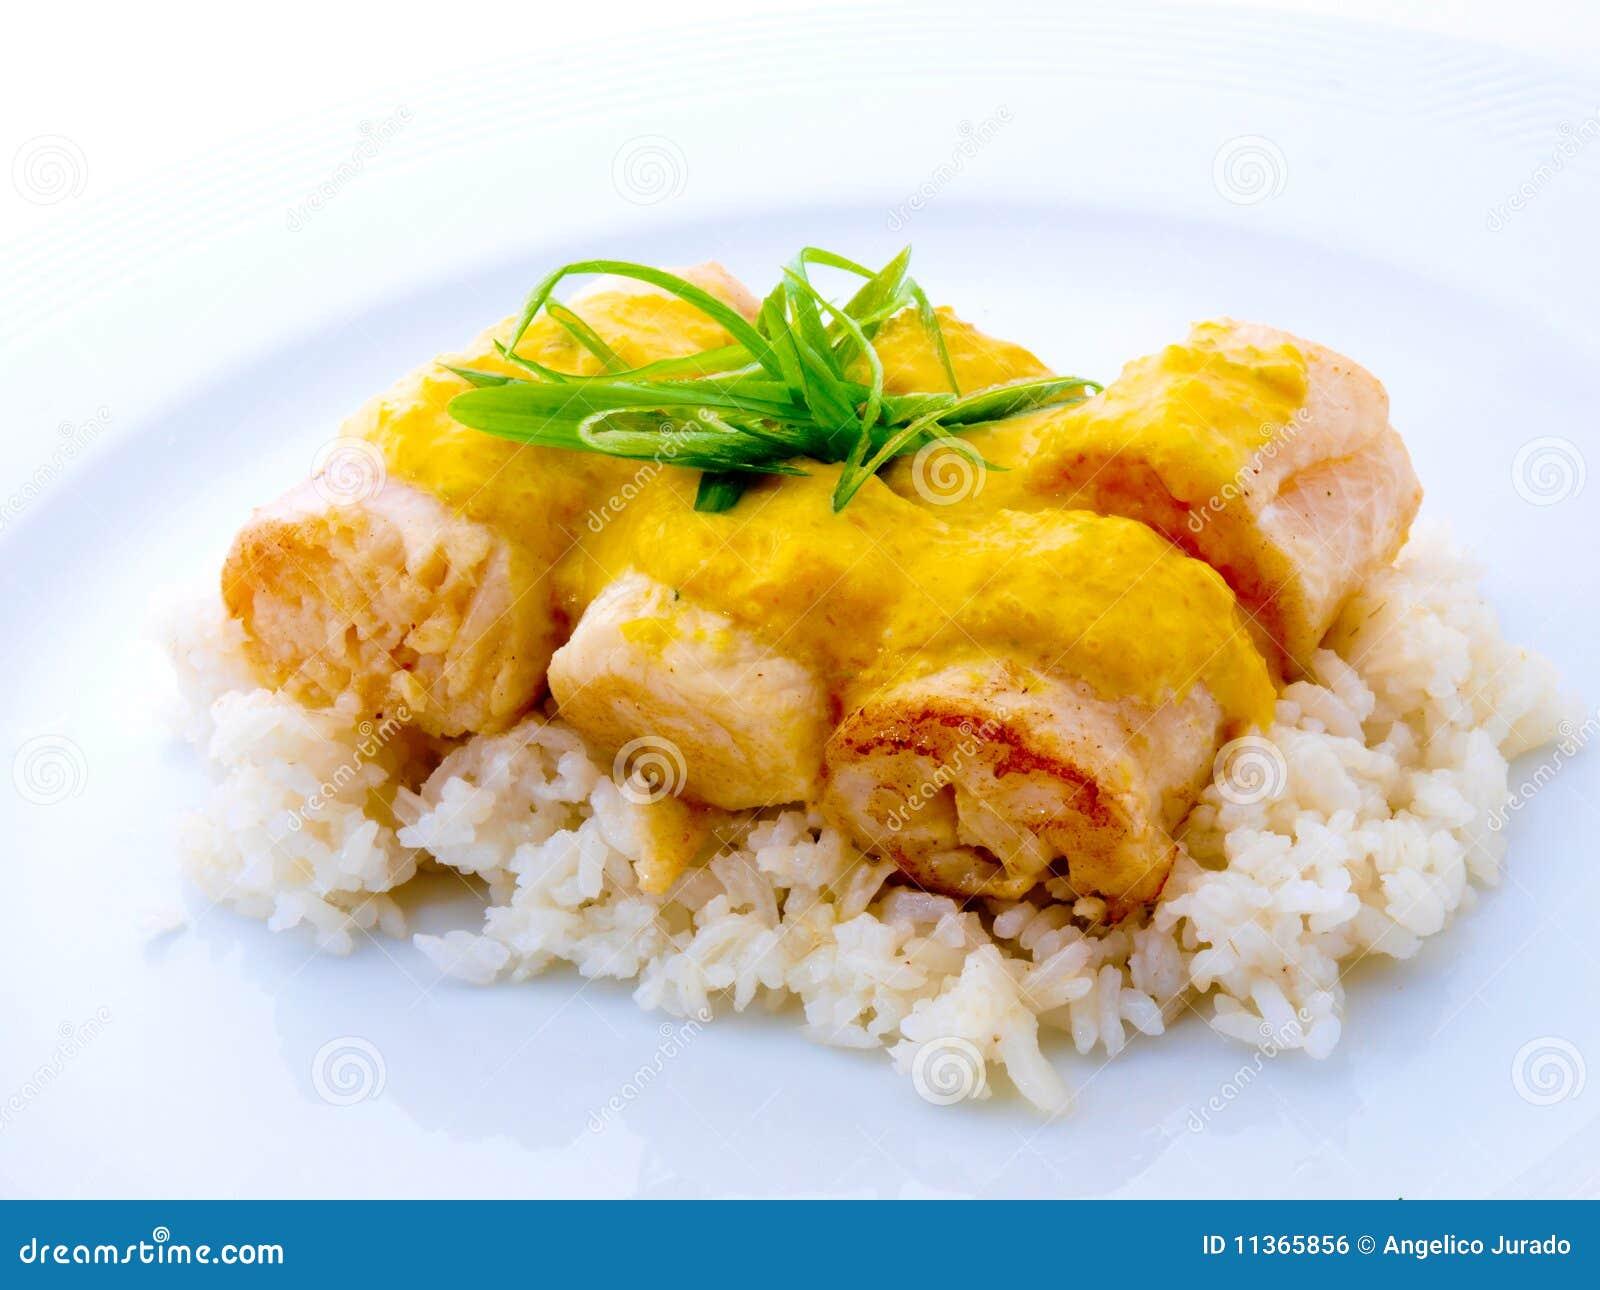 Gourmet fish salad royalty free stock image for Gourmet fish recipes